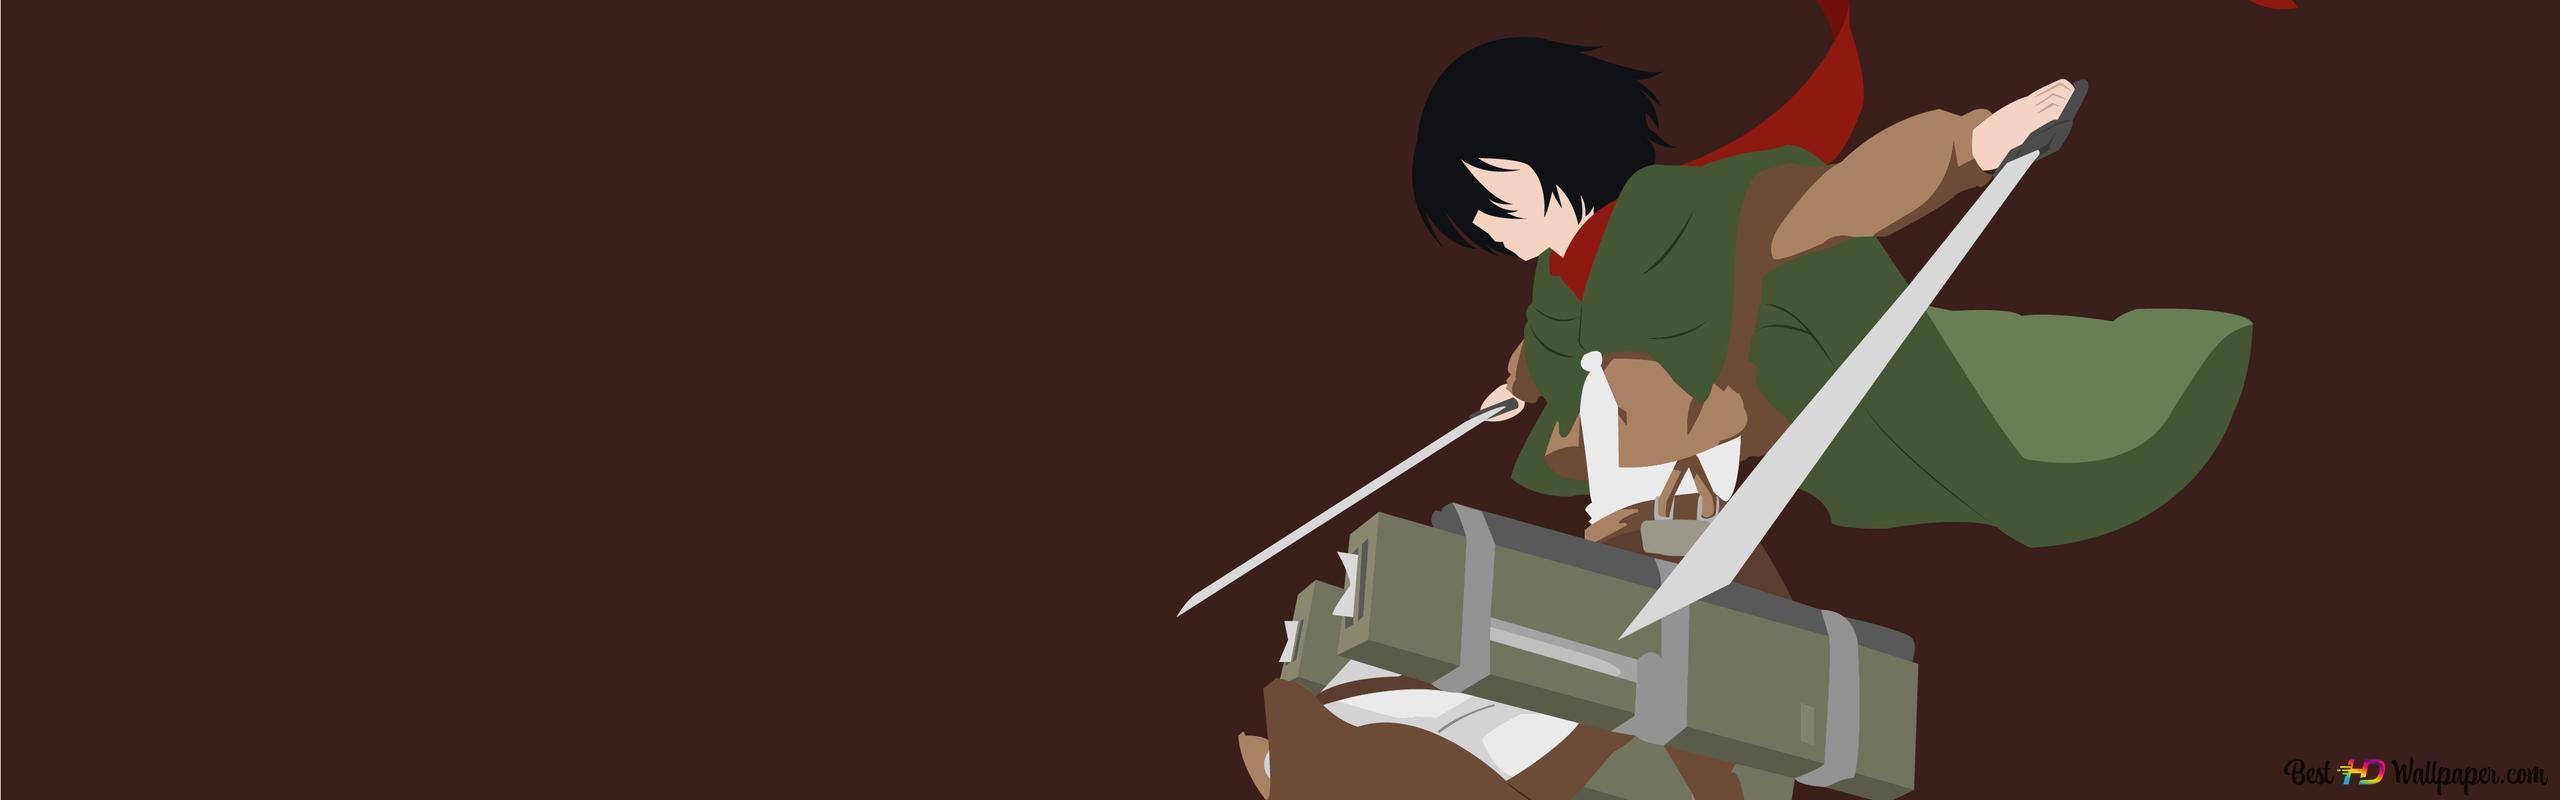 Mikasa Ackerman Hd Wallpaper Download